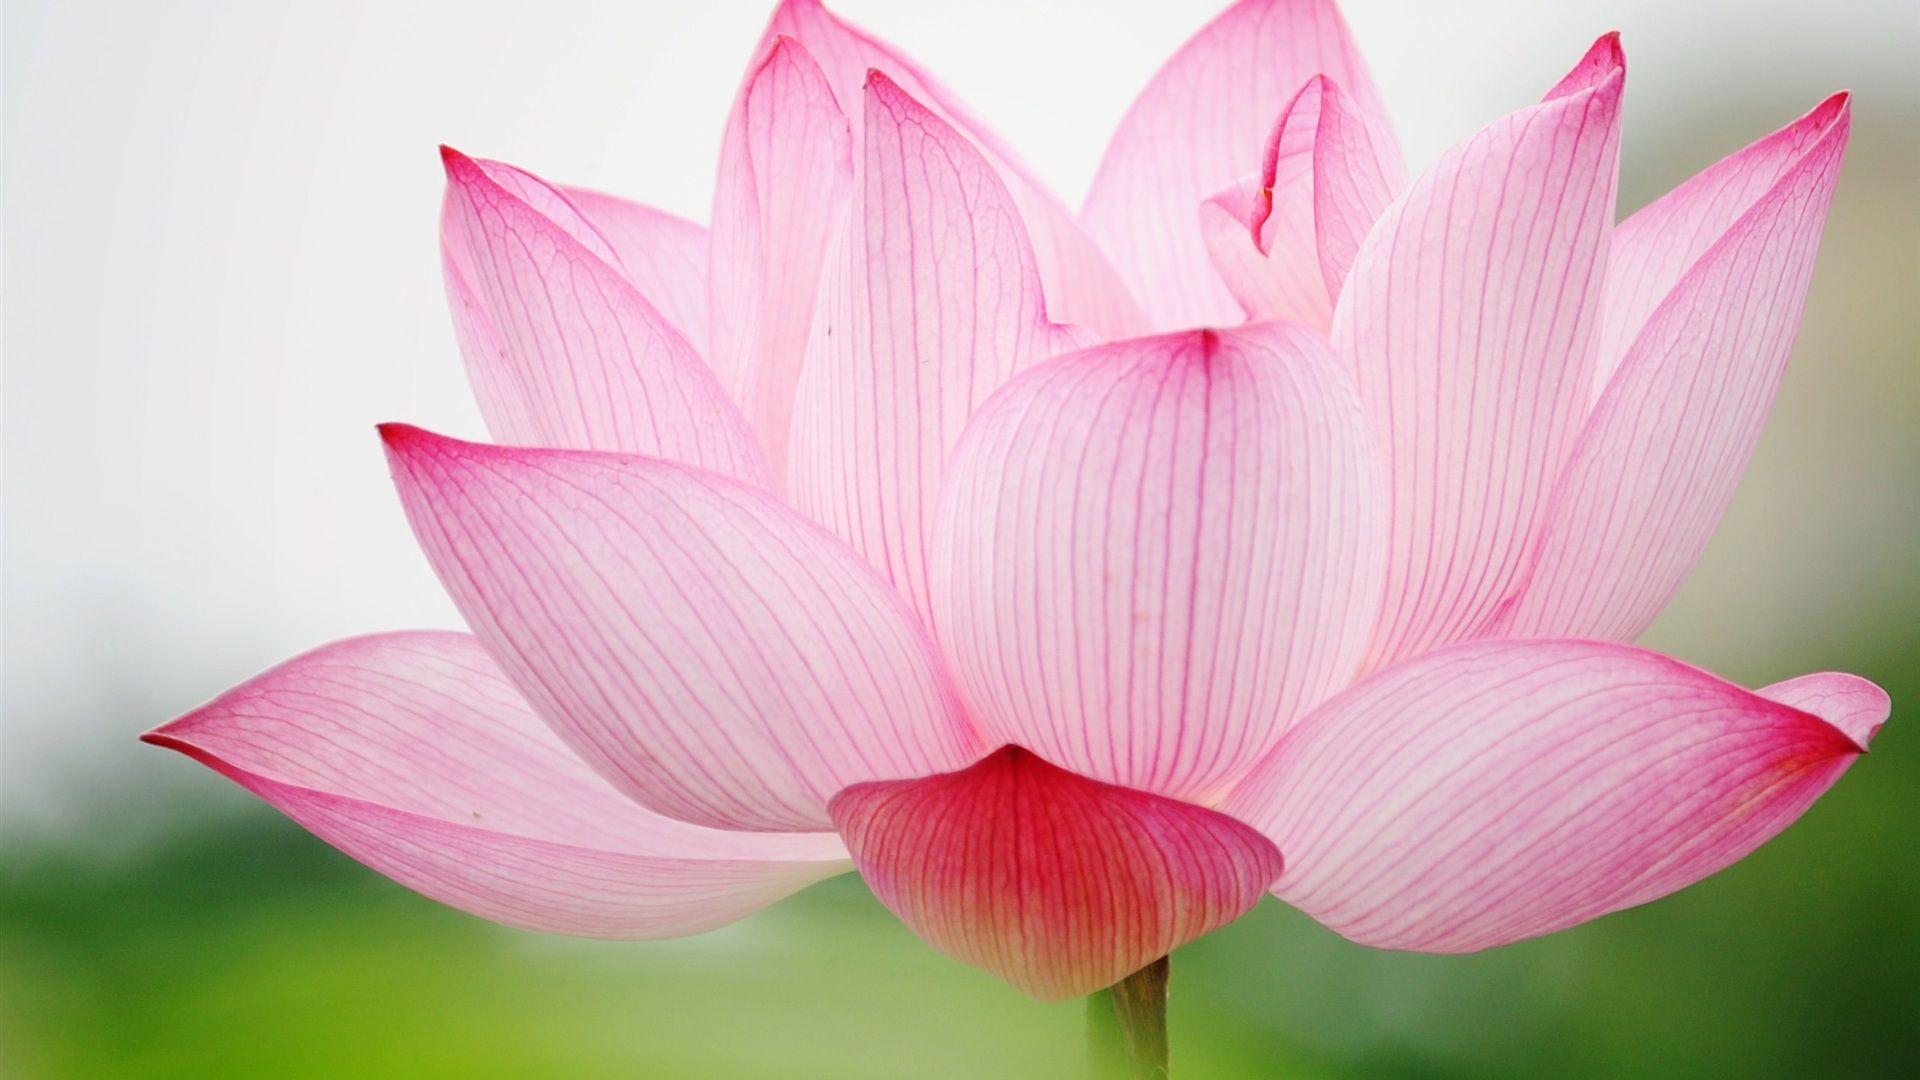 Free Yoga Clip Art Lotus Blossom Images Of Pink Lotus Macro